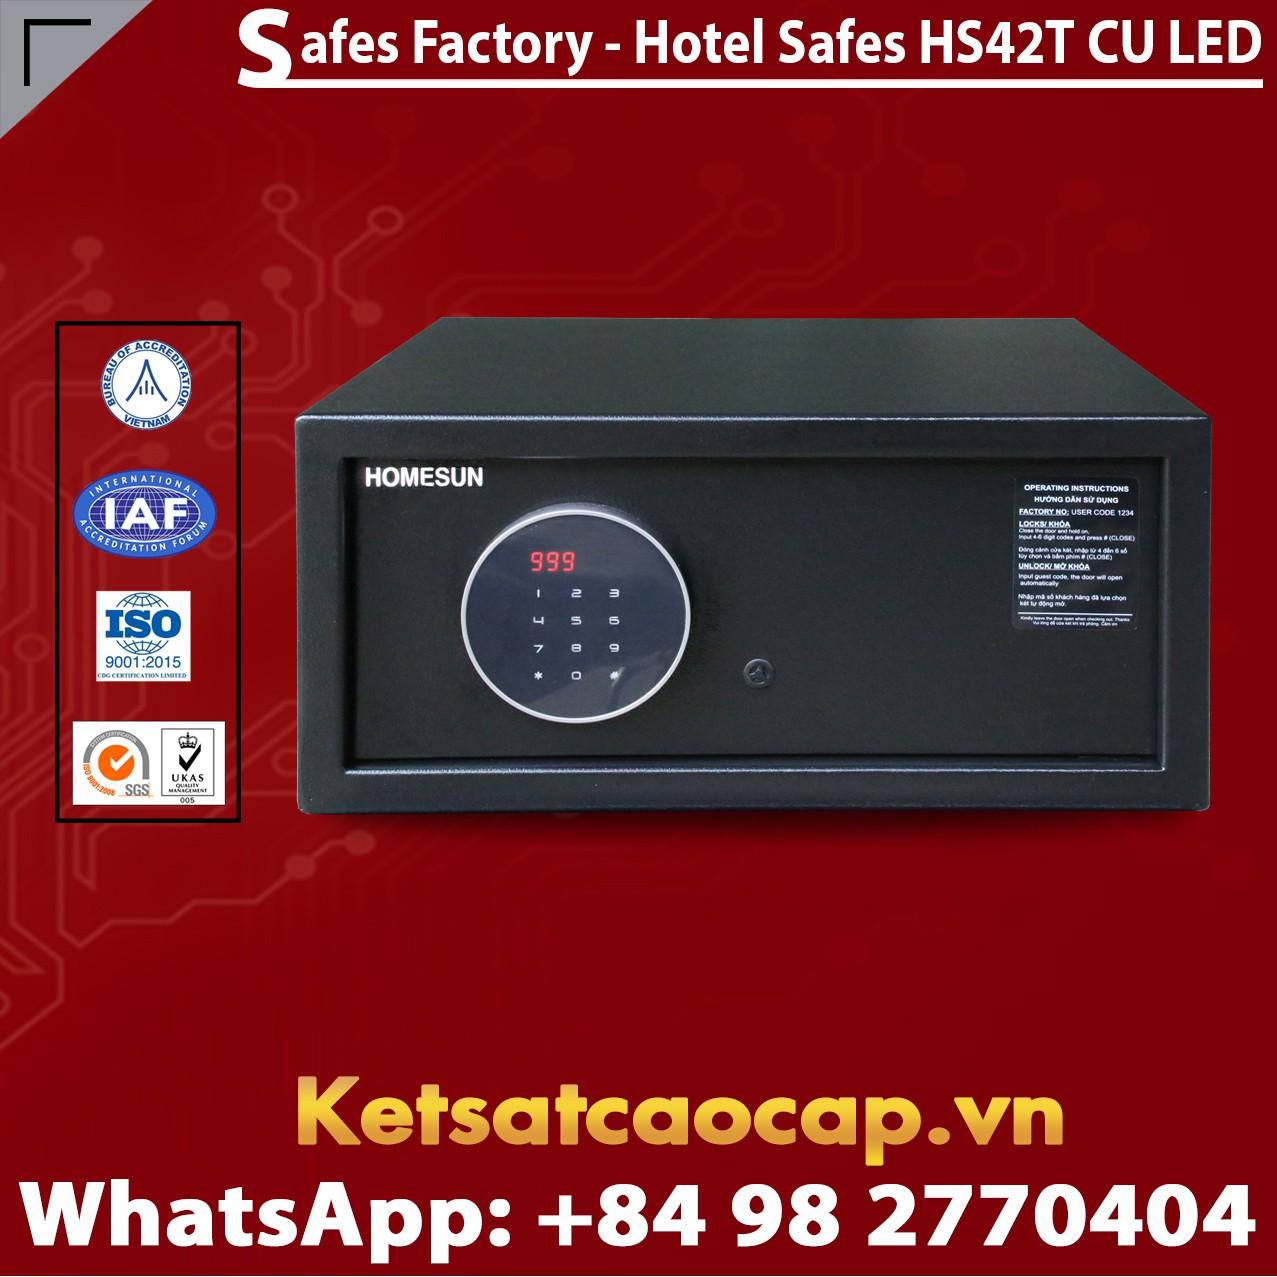 Két Sắt Khách Sạn Hotel Safes HOMESUN HS42T CU LED